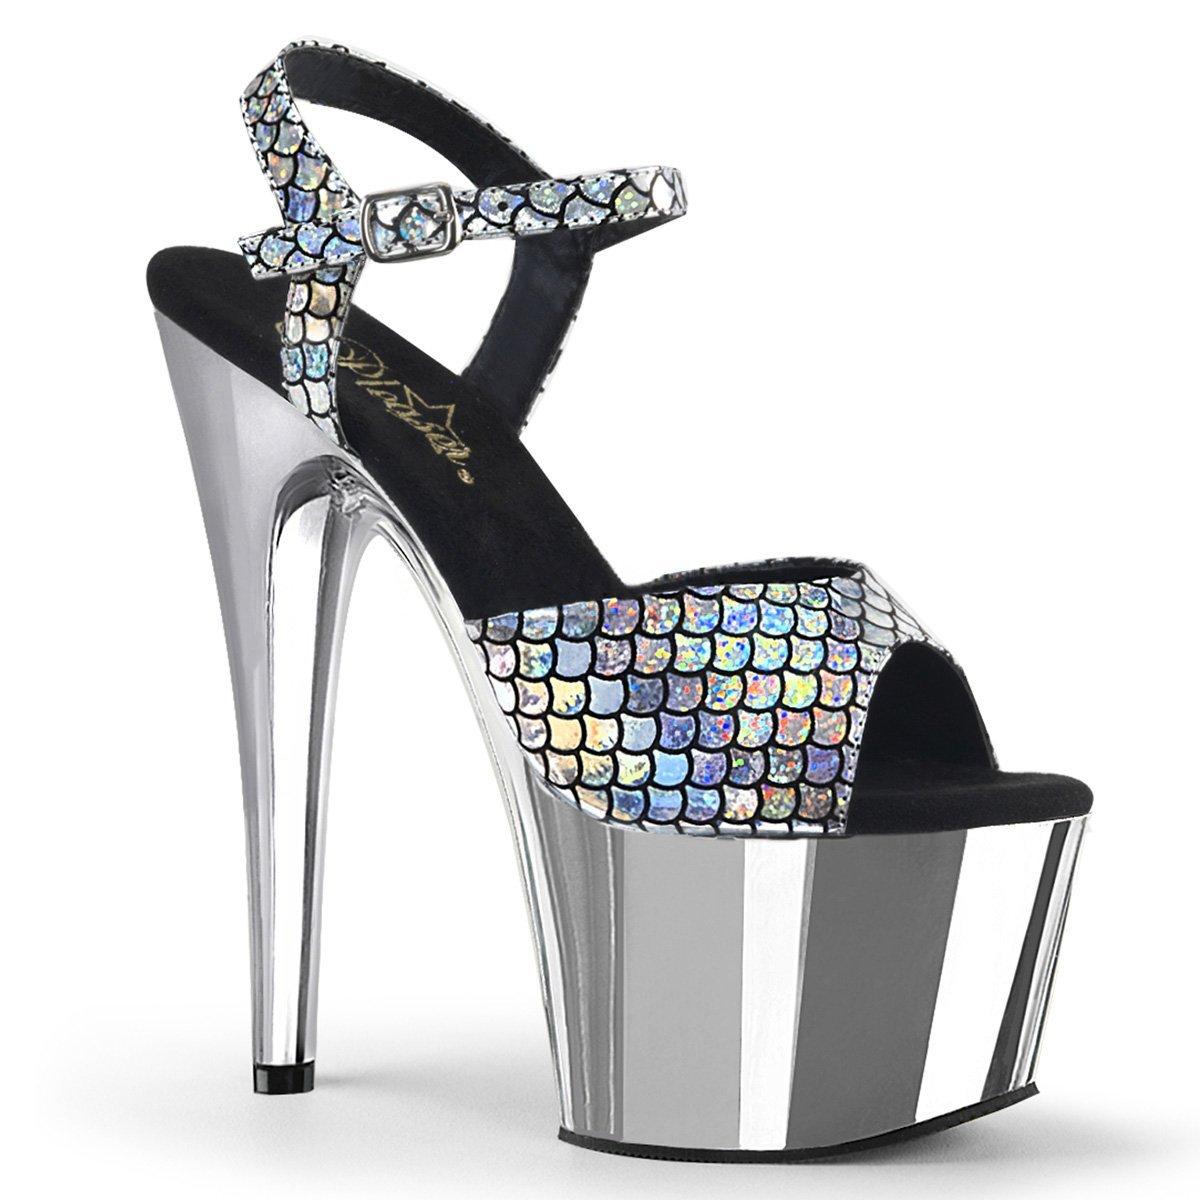 Women's Adore Iridescent Fish Scale Design Ankle-Strap Platform Sandals - DeluxeAdultCostumes.com